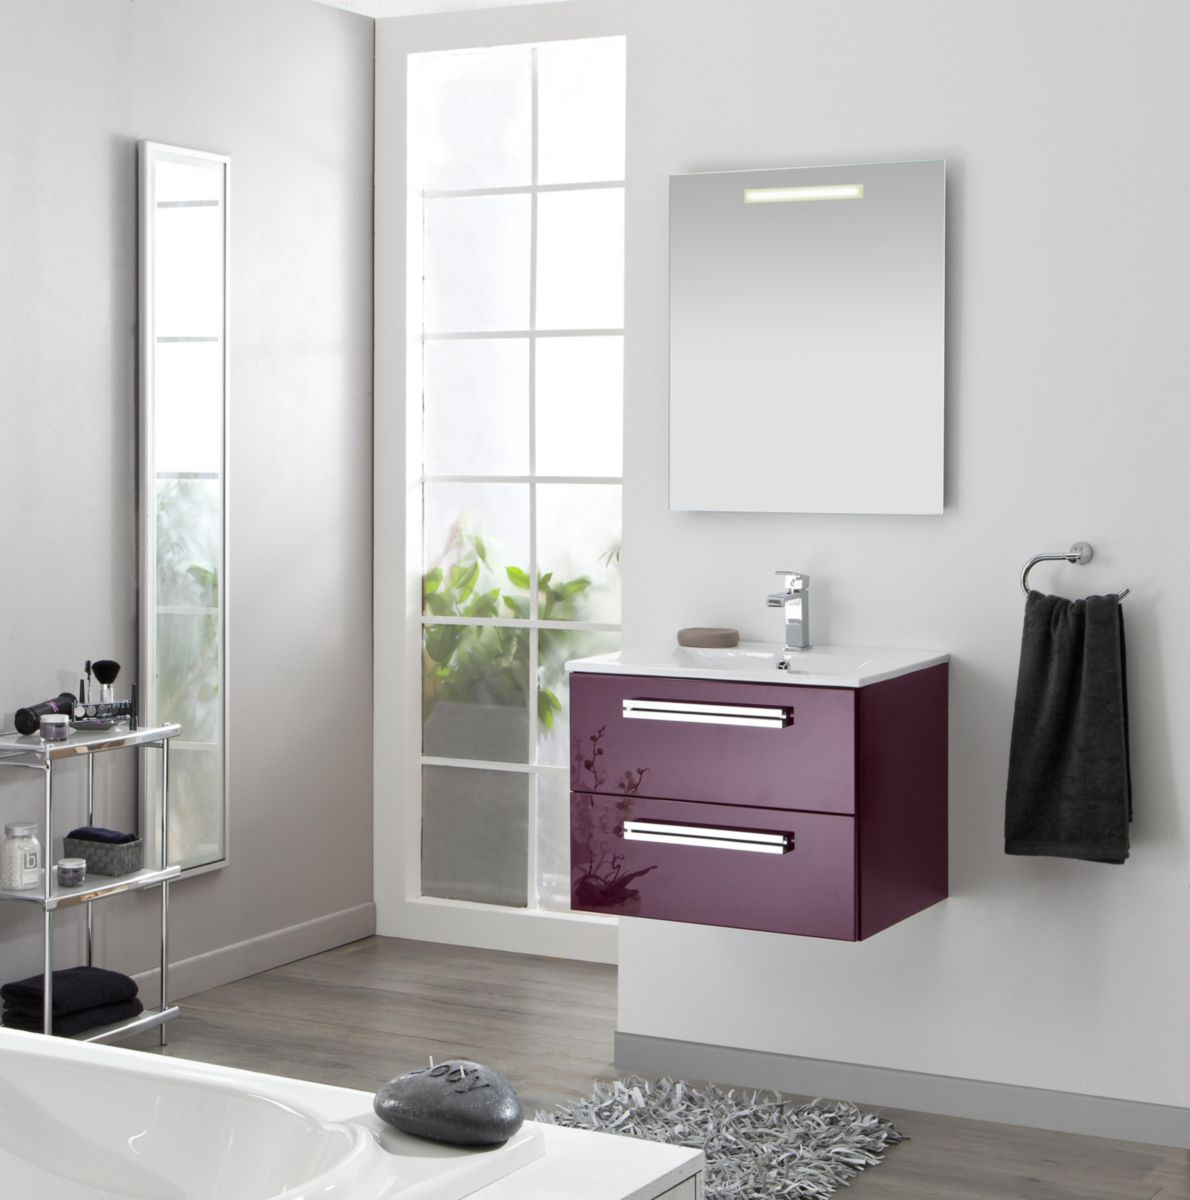 meuble sous vasque seducta 60 cm 2 tiroirs aubergine alterna sanitaire brossette - Meuble Salle De Bain Brossette